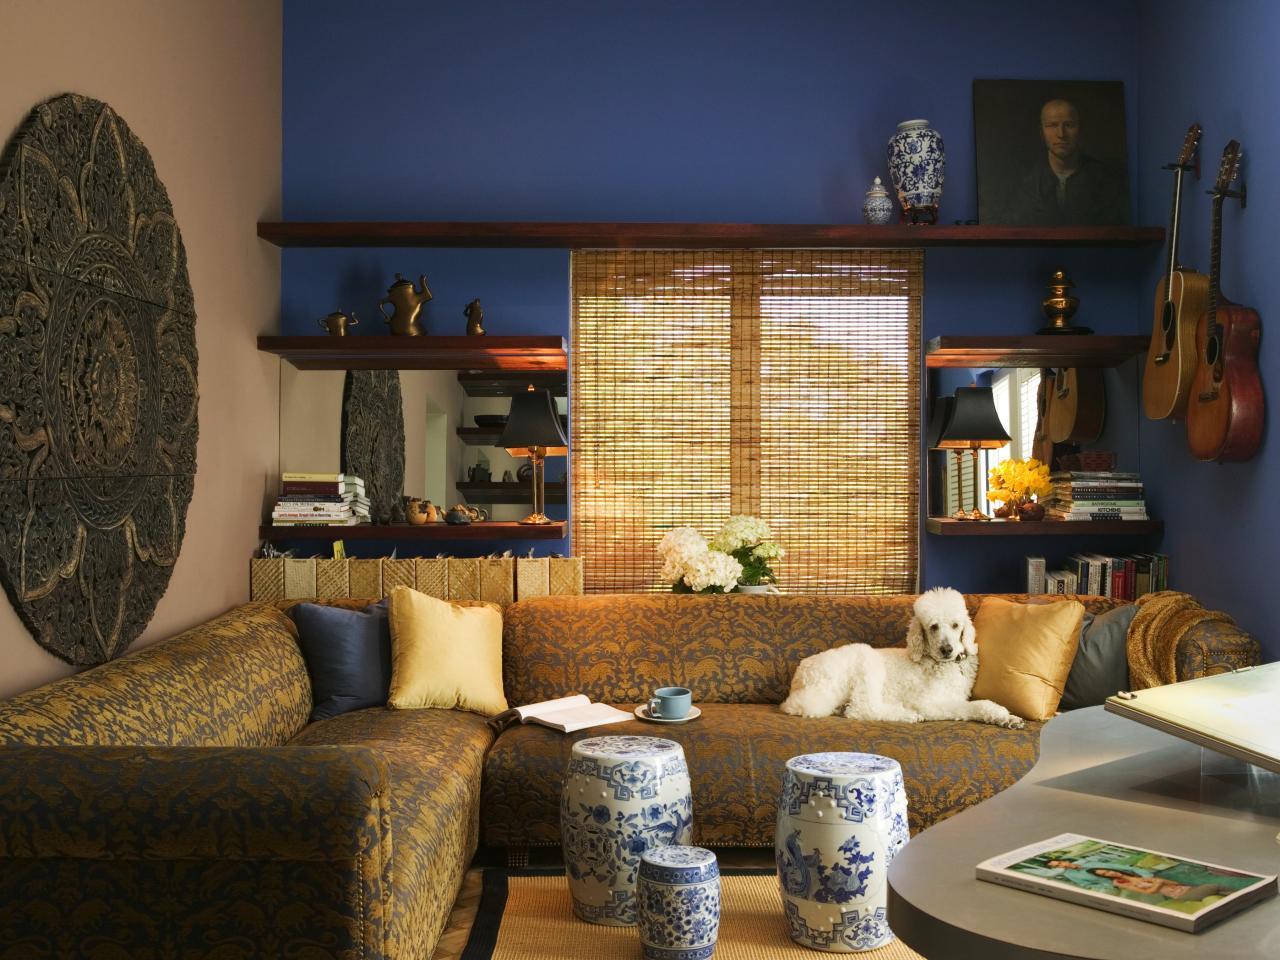 DP_Jane-Ellison-elegant-asian-style-living-room-blue-walls_s4x3.jpg.rend.hgtvcom.1280.960